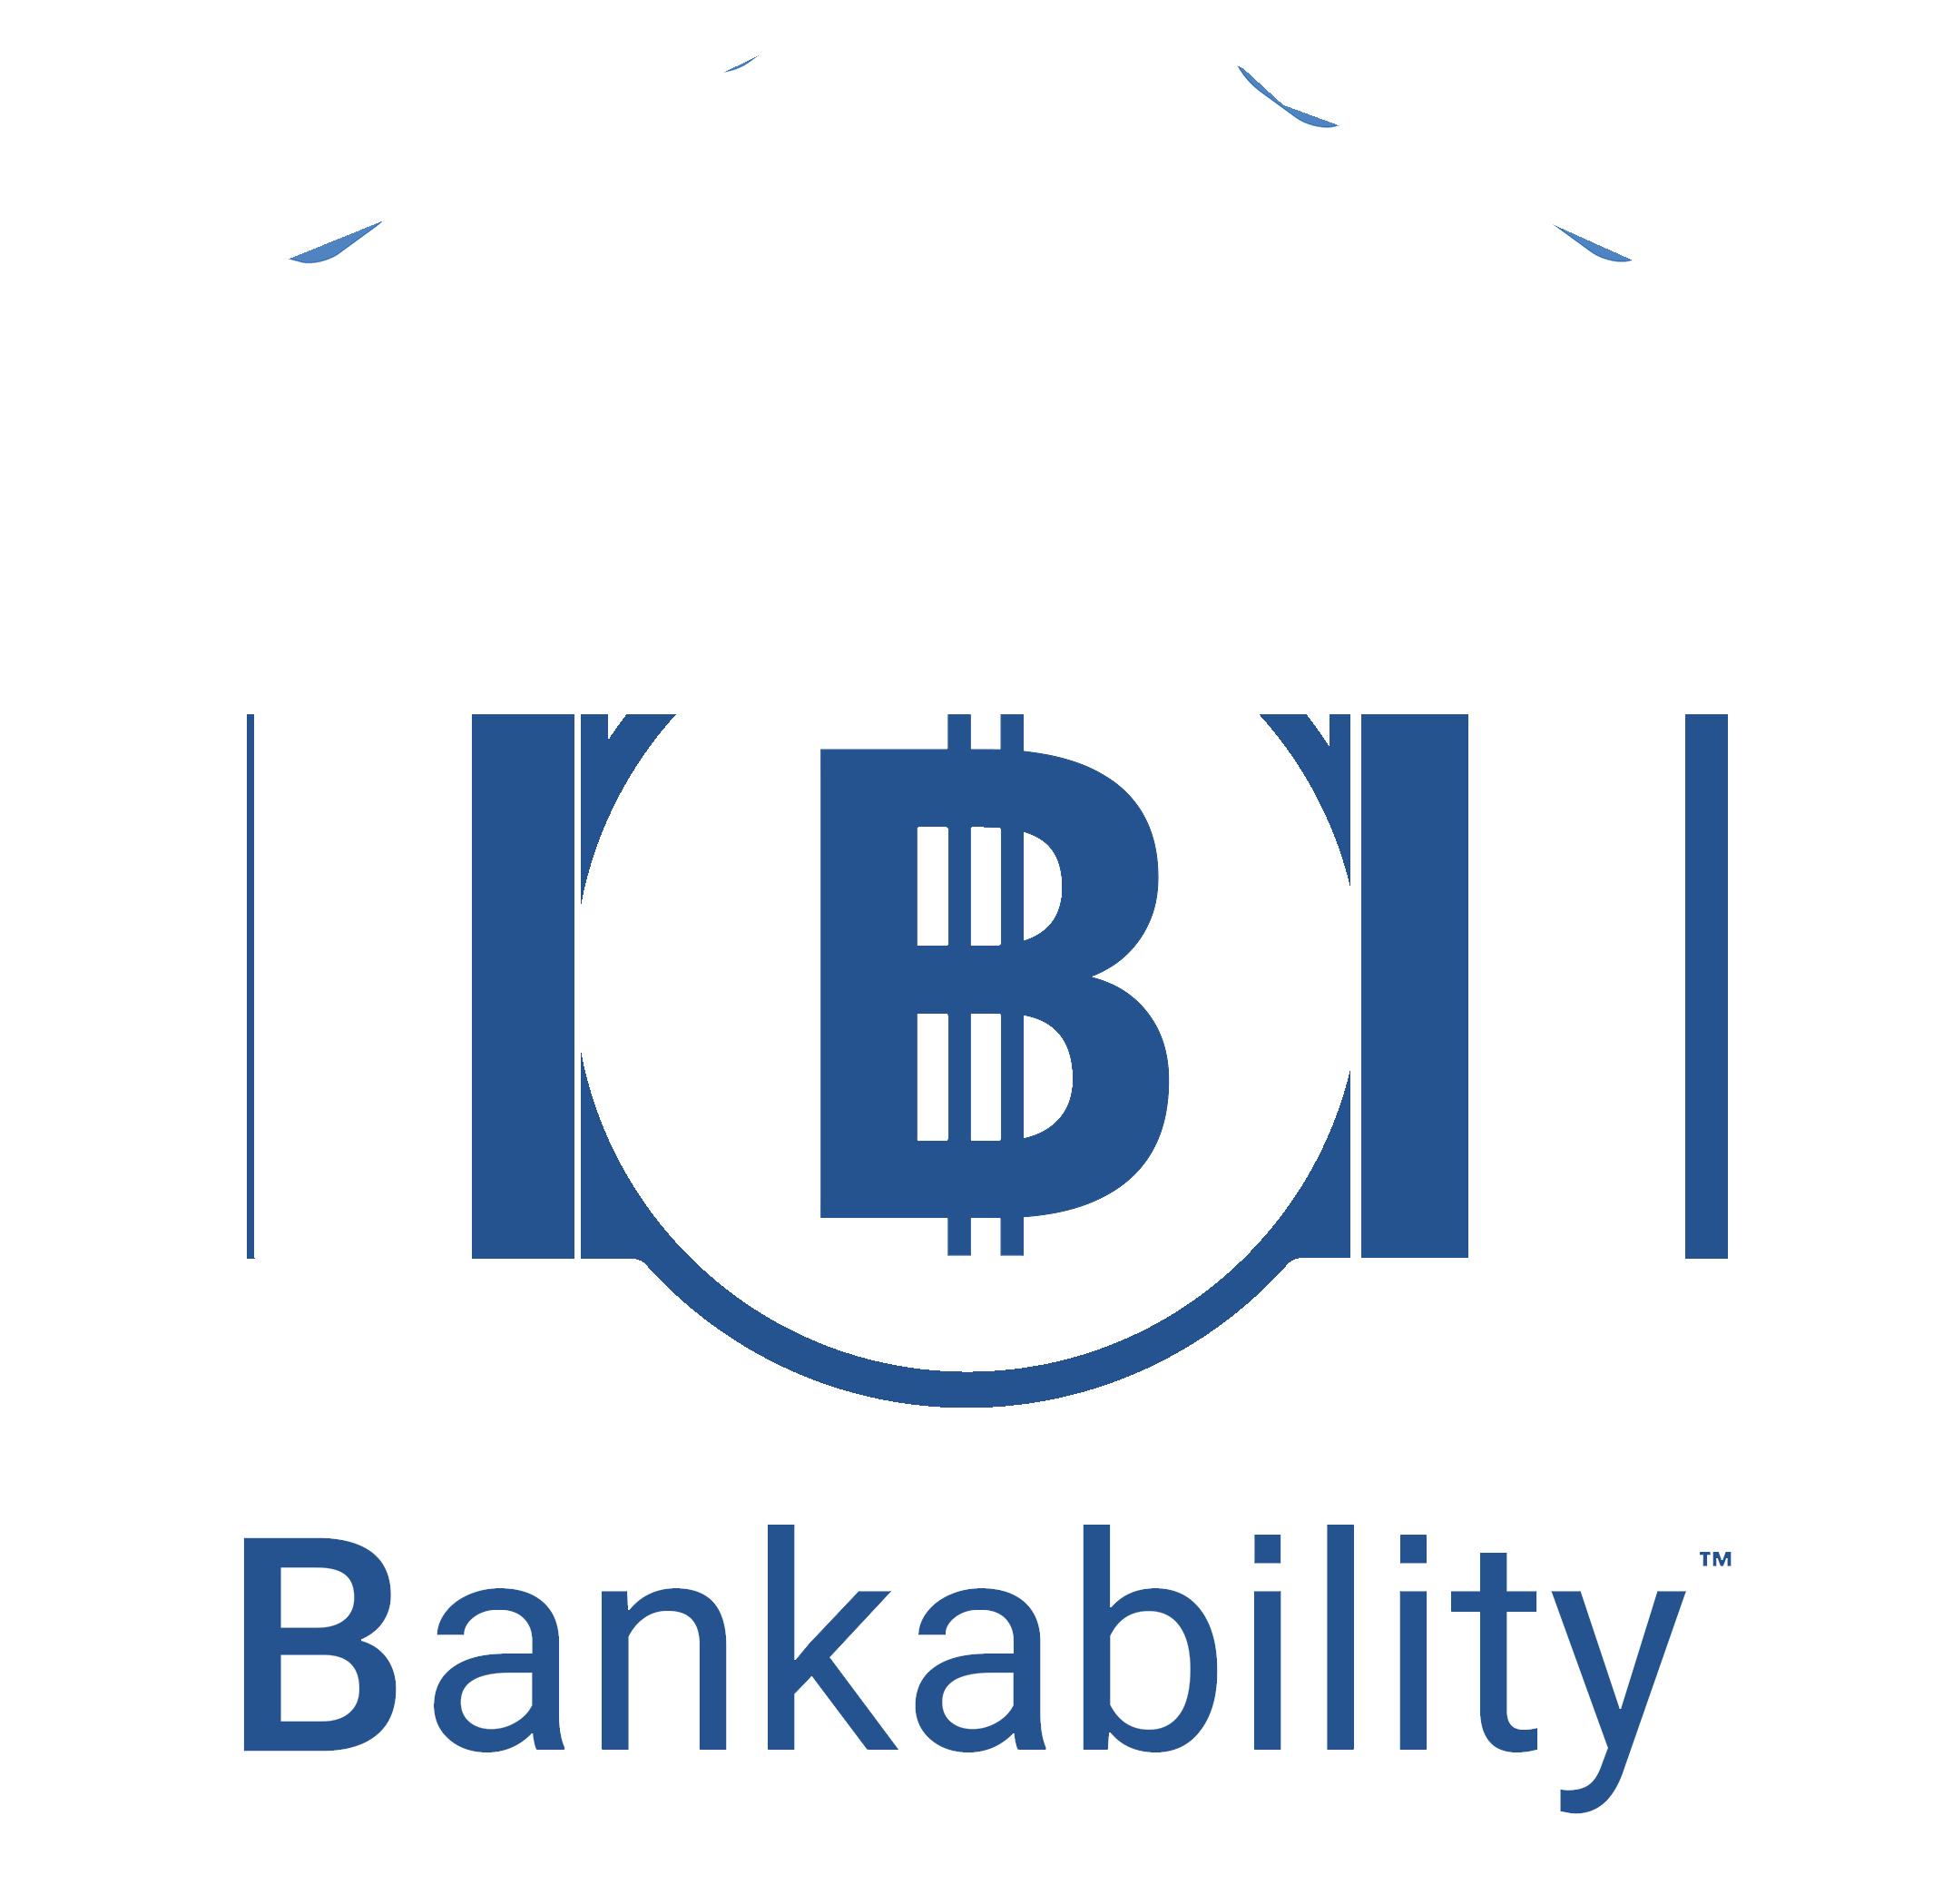 bankability white